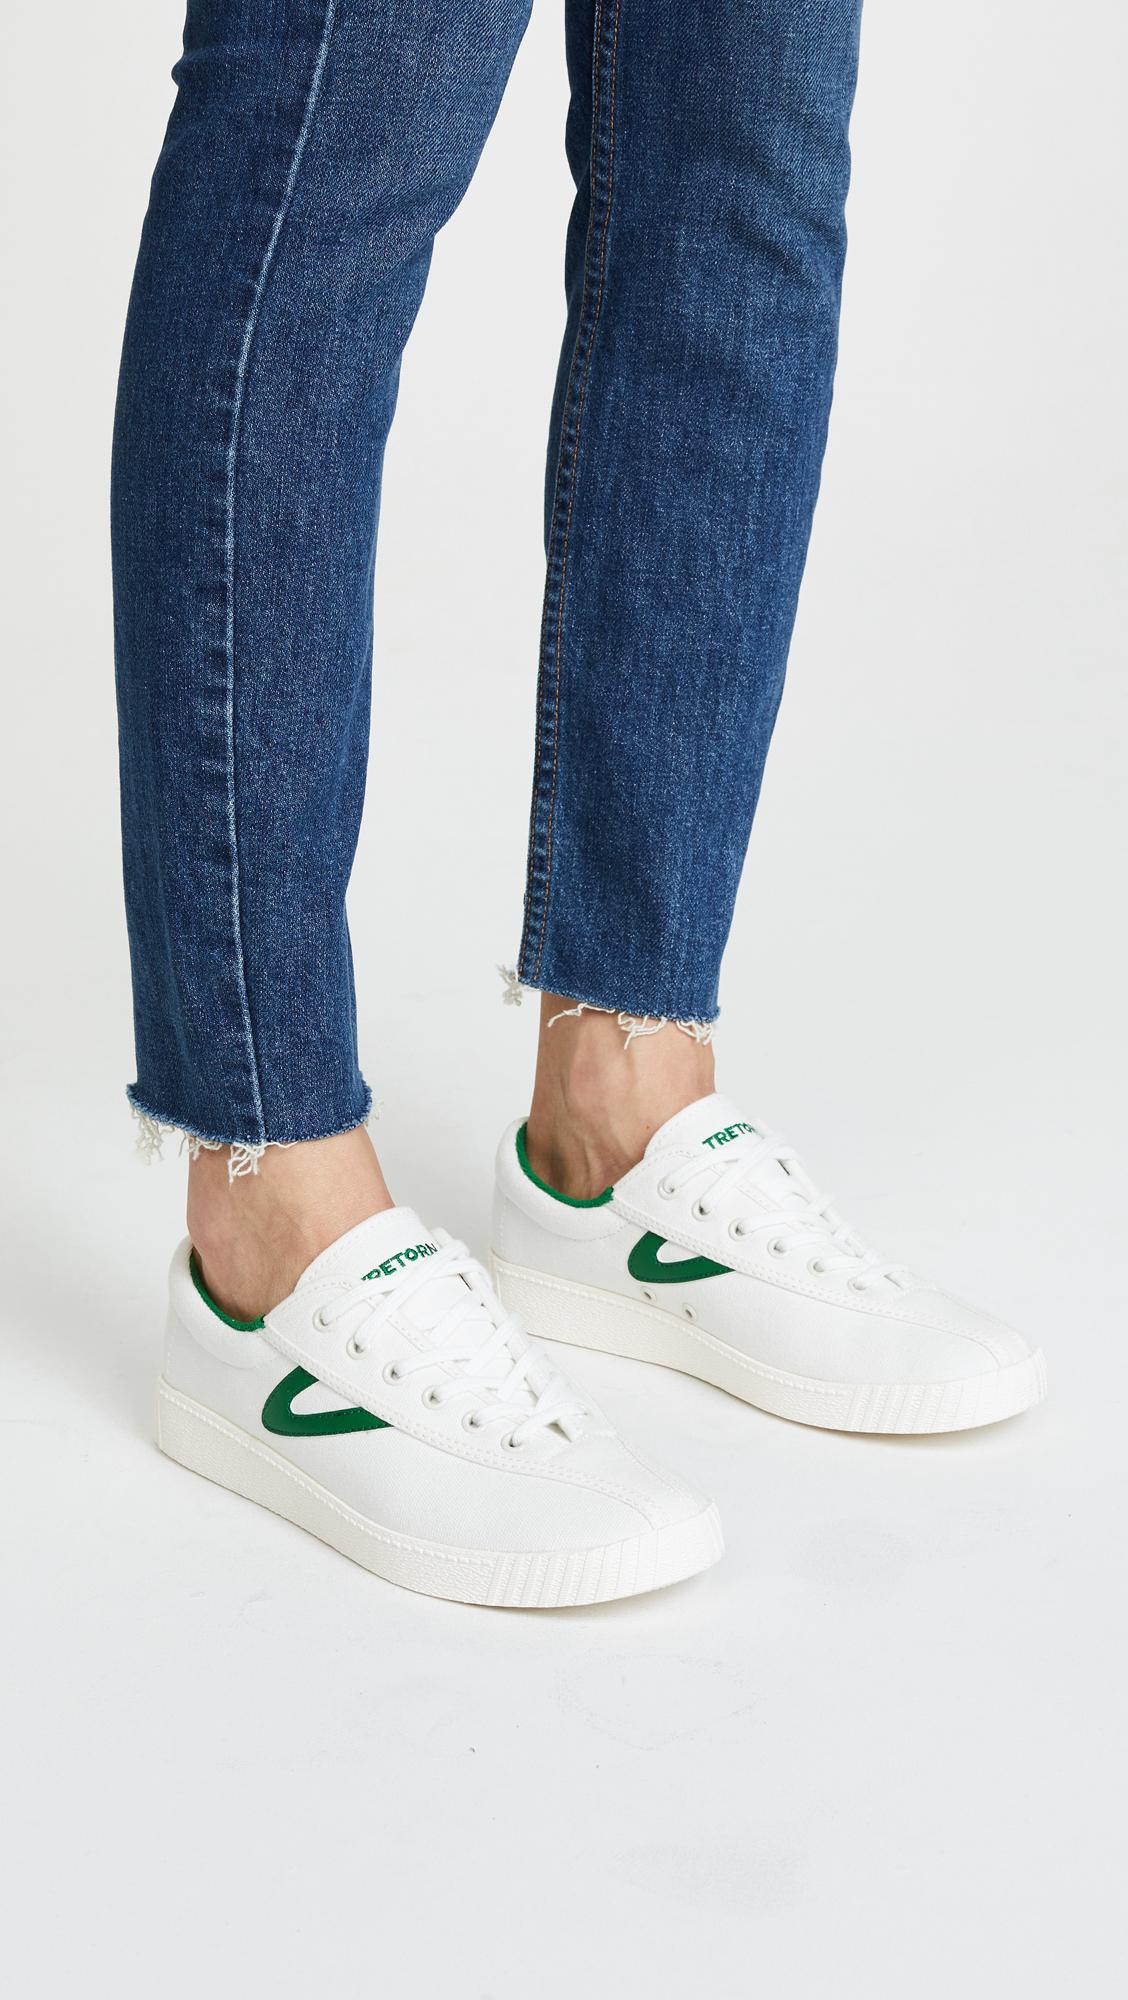 4cd889e89542 Tretorn Nylite Sneakers